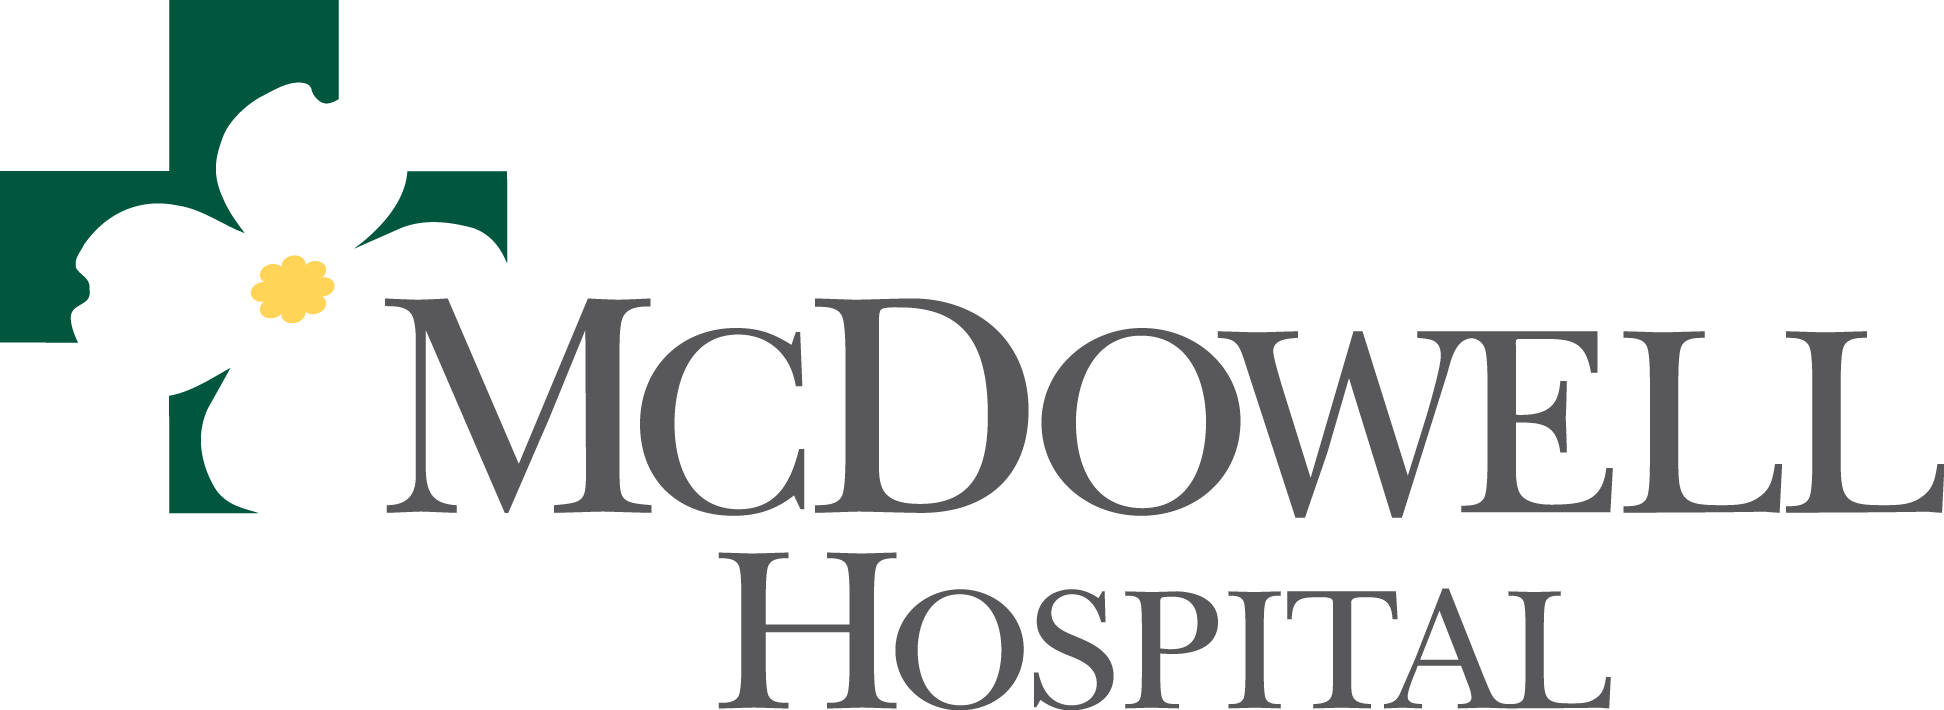 Image result for mcdowell hospital logo